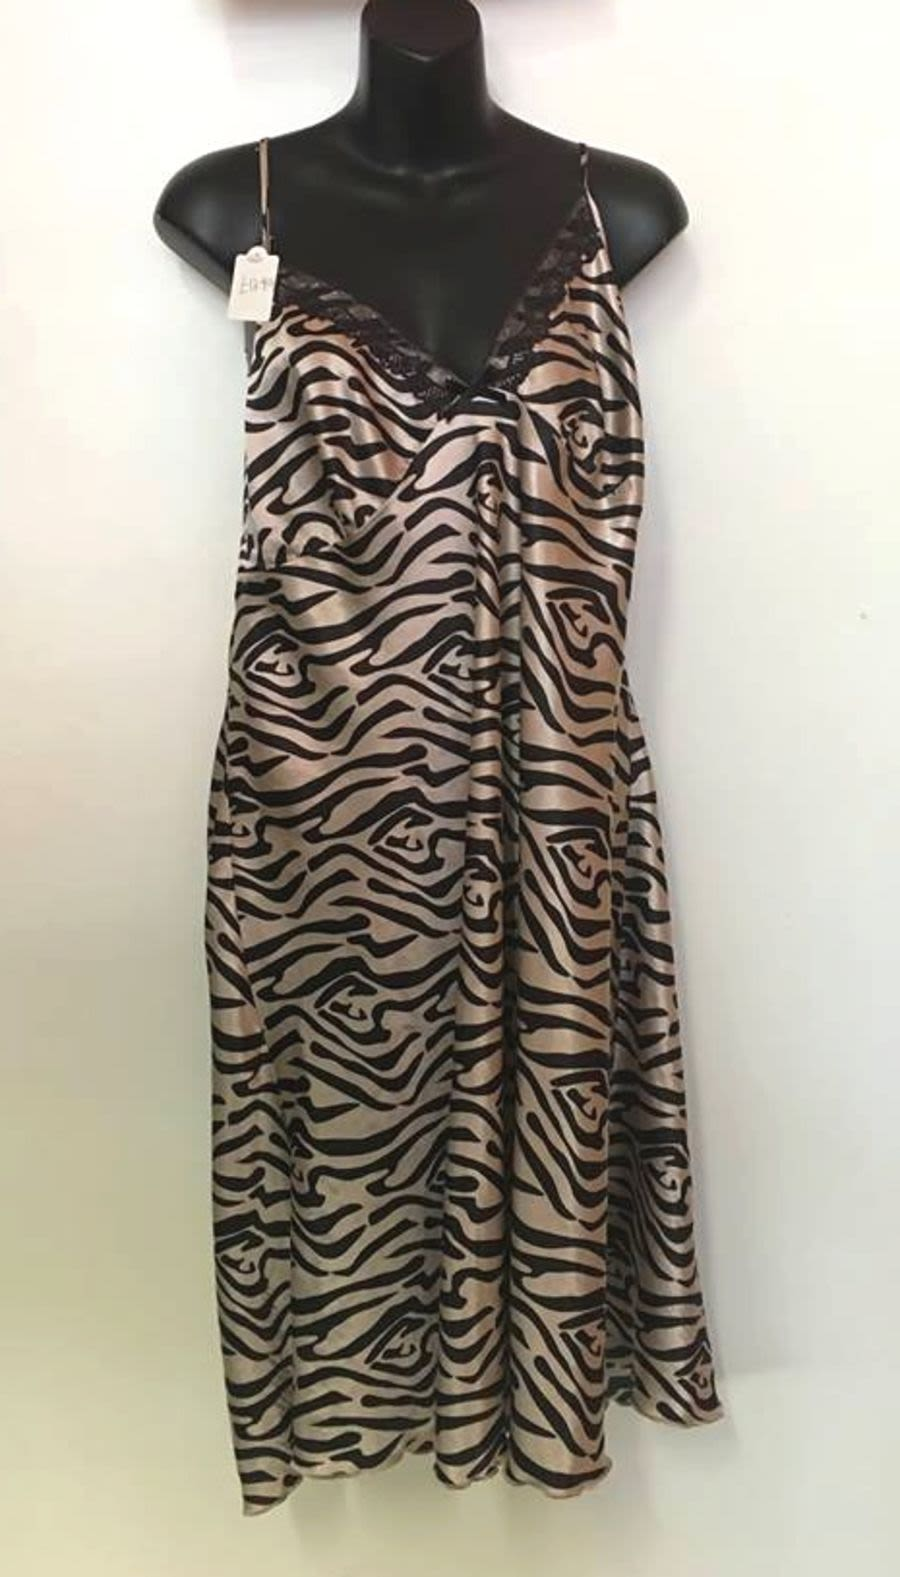 Vintage Womens 1990's Black and White Zebra Print Silk Slip Dress